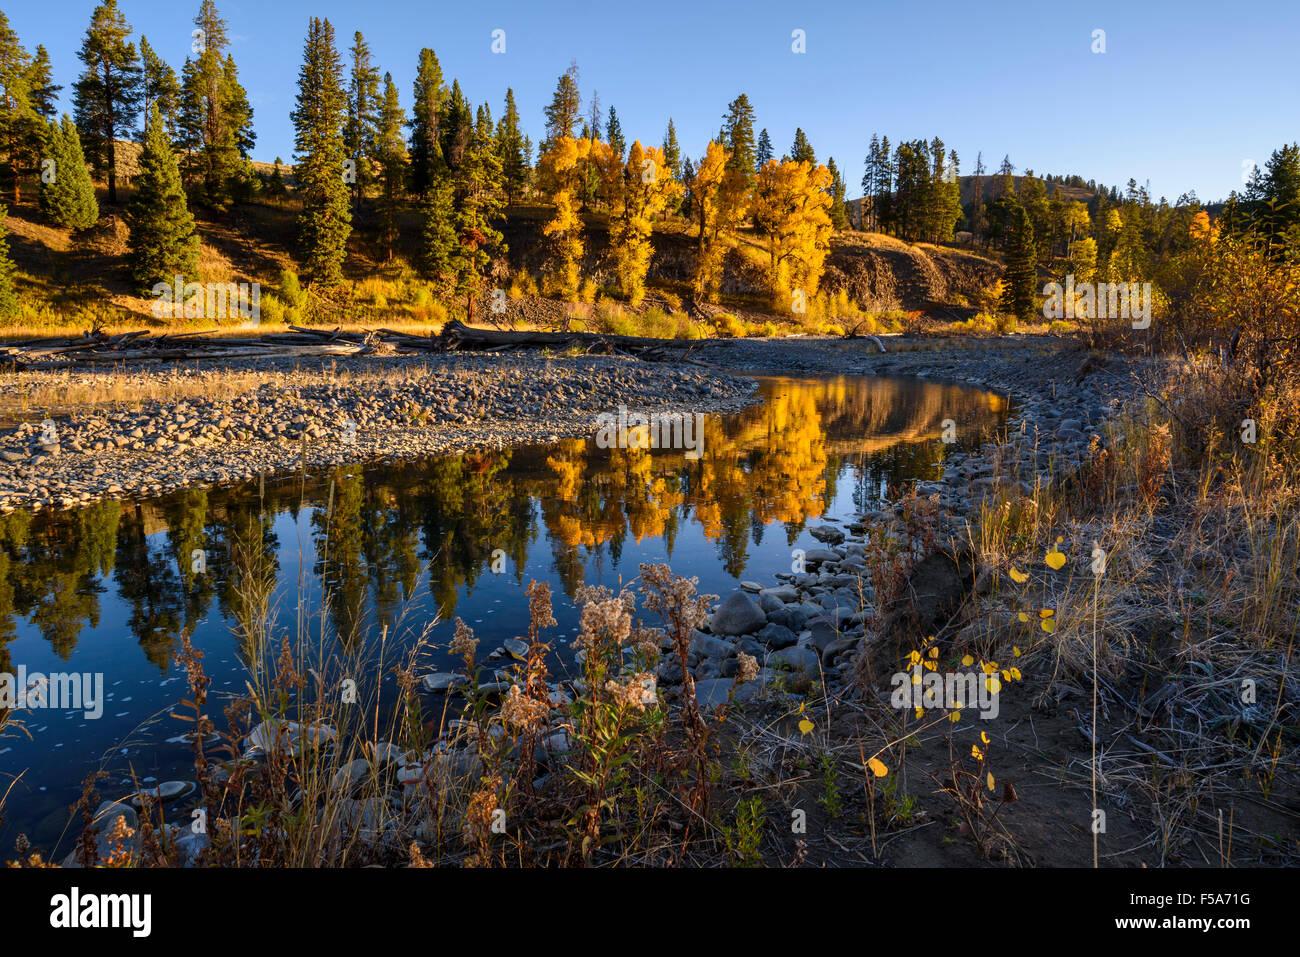 Cottonwood trees, Populus sp., Cache Creek, Yellowstone National Park, Wyoming, USA - Stock Image